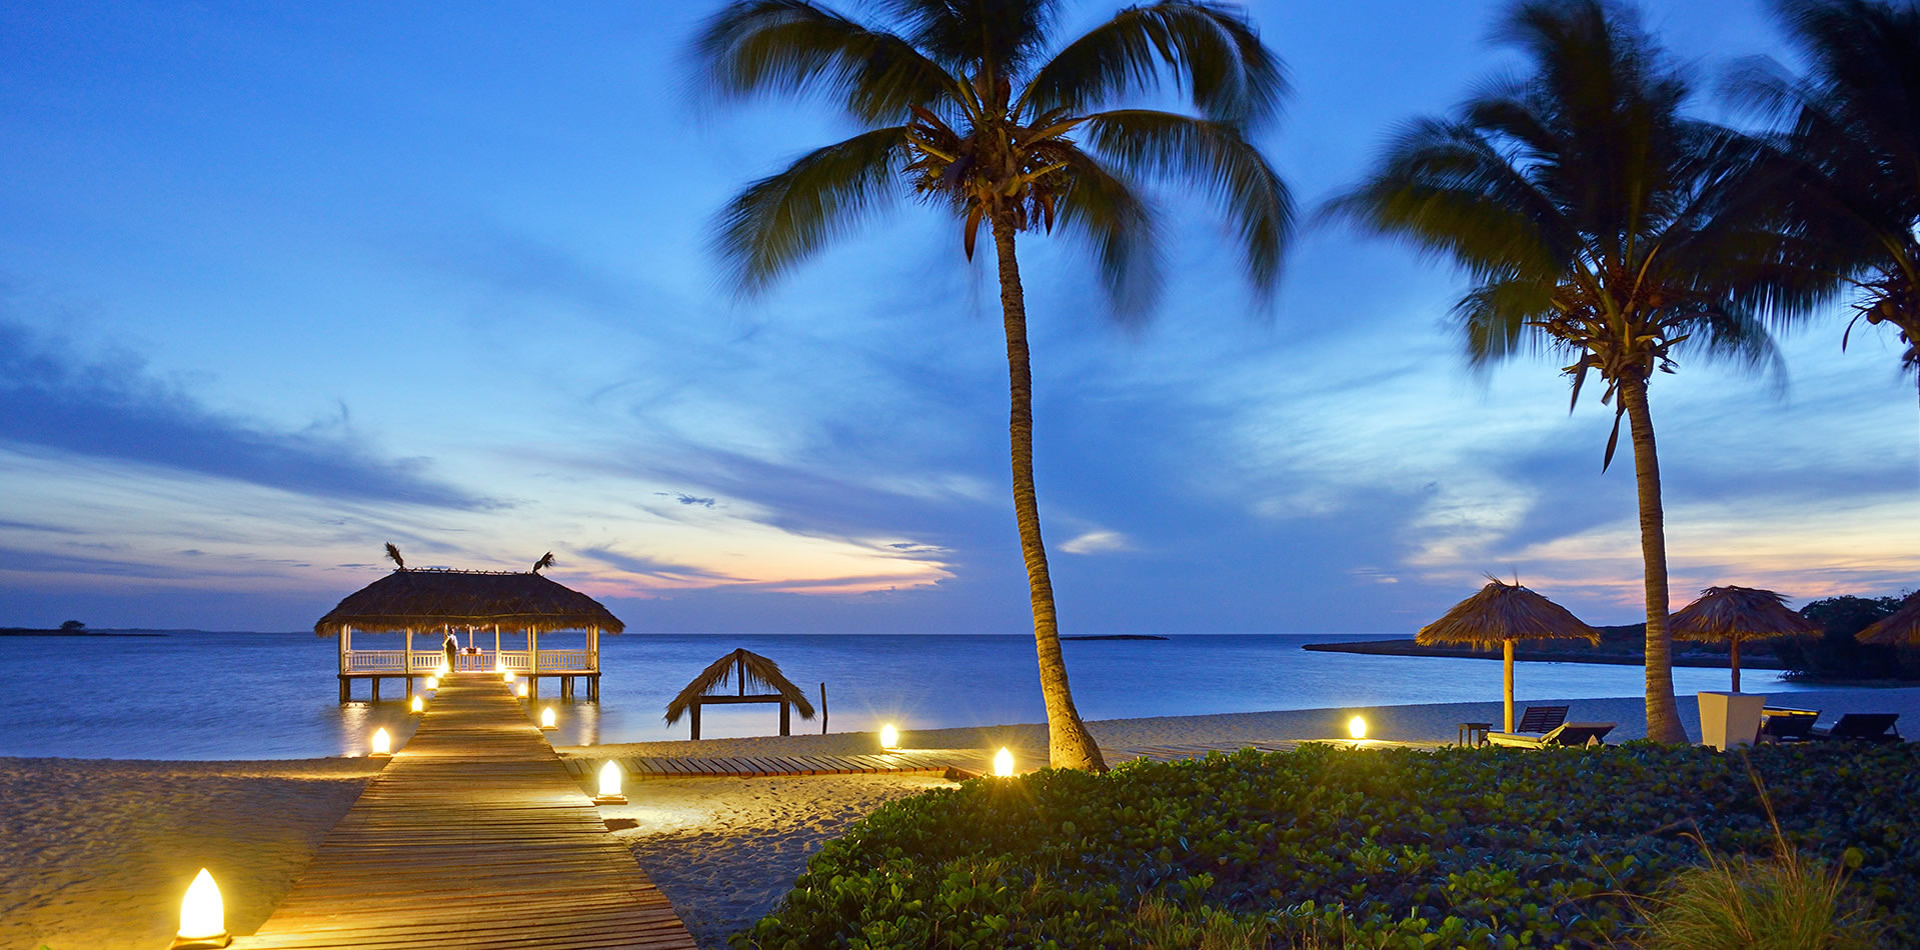 Luxury hotels in Varadero, Cuba – Special offer at Meliá Cuba luxury hotels